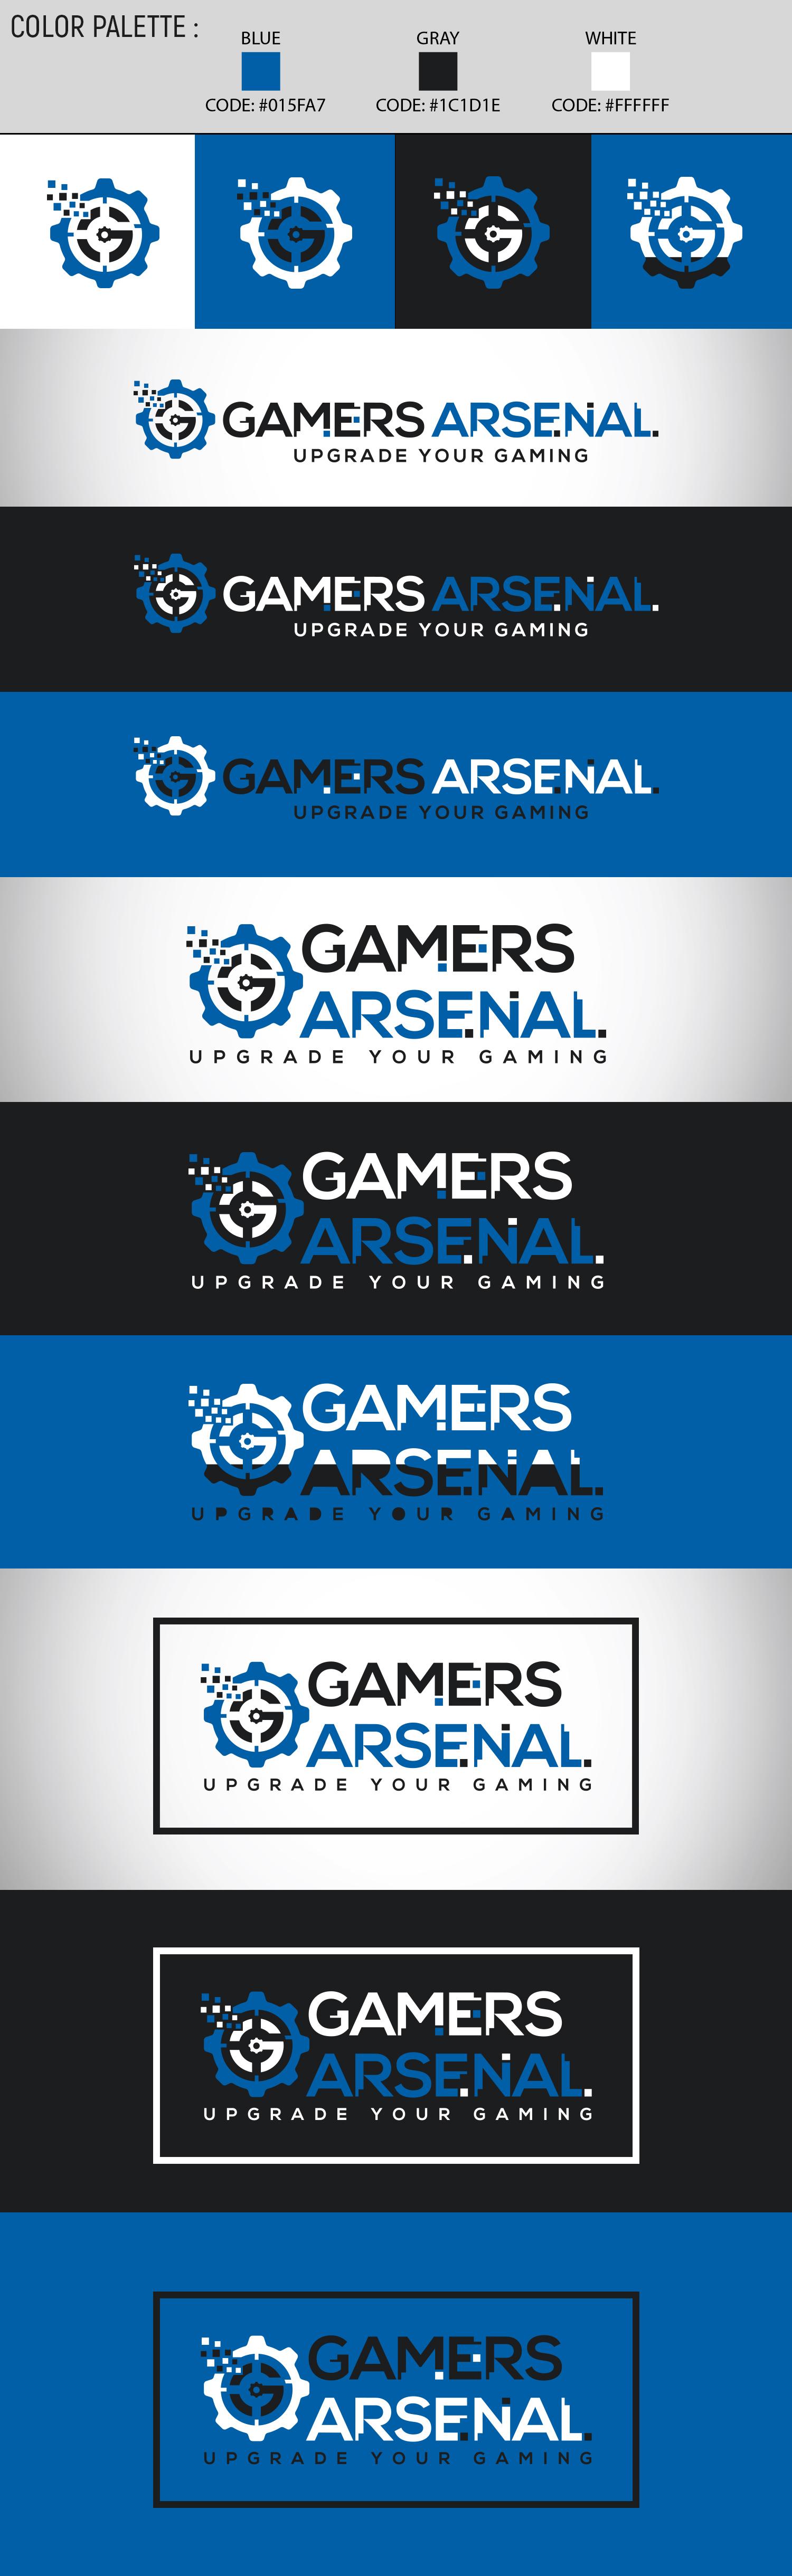 Modern Masculine Logo Design For Gamers Arsenal By Mustakim Design 23033377,Hazel Brown Chocolate Brown Chestnut Brown Hair Color